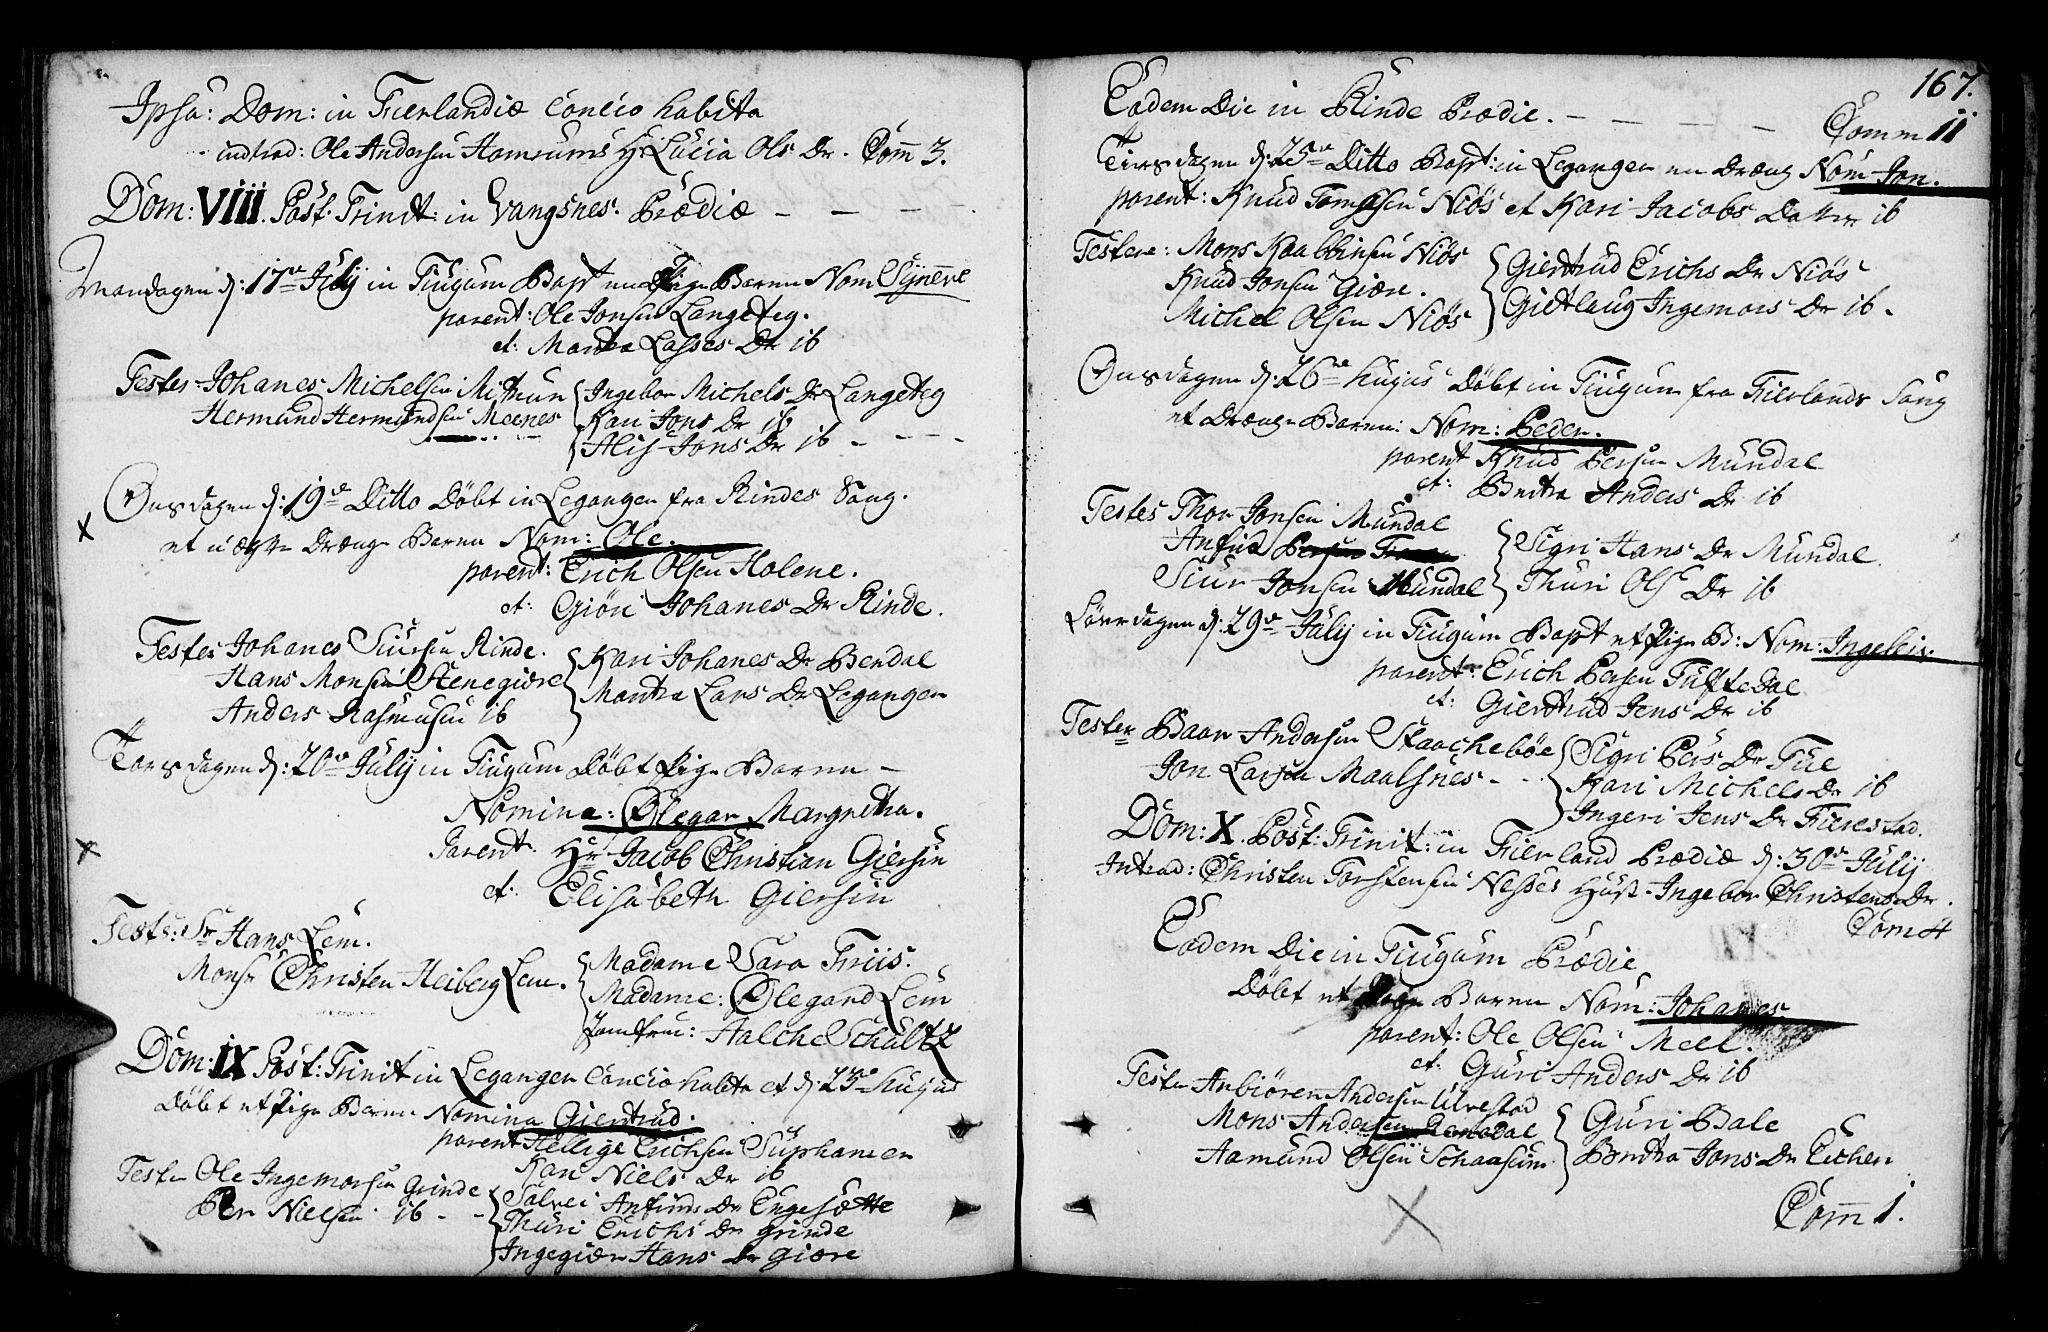 SAB, Leikanger sokneprestembete, Ministerialbok nr. A 3, 1756-1770, s. 167